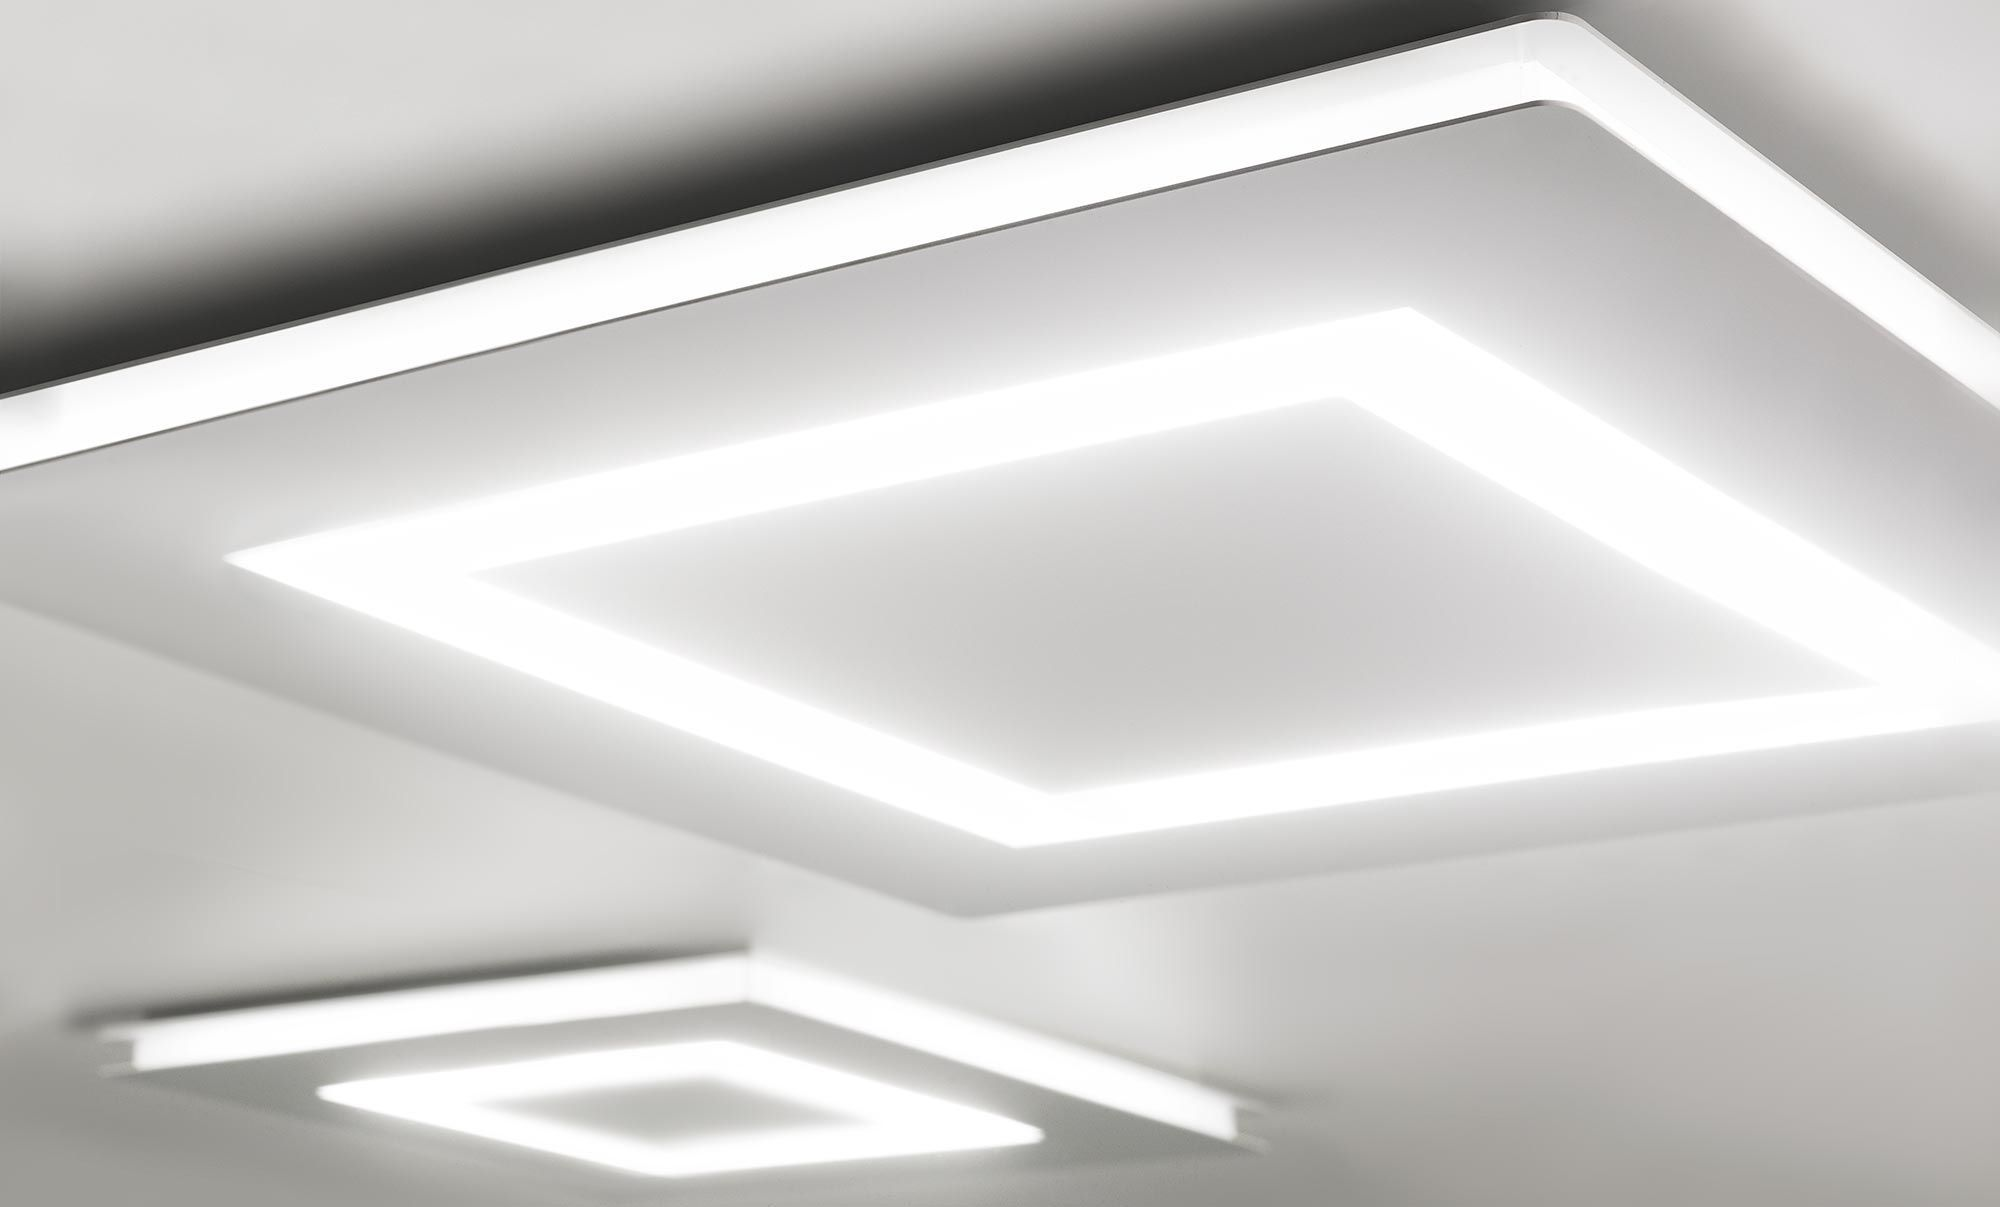 Plafoniere Quadrata : Plafoniera moderna quadrata in metallo policarbonato